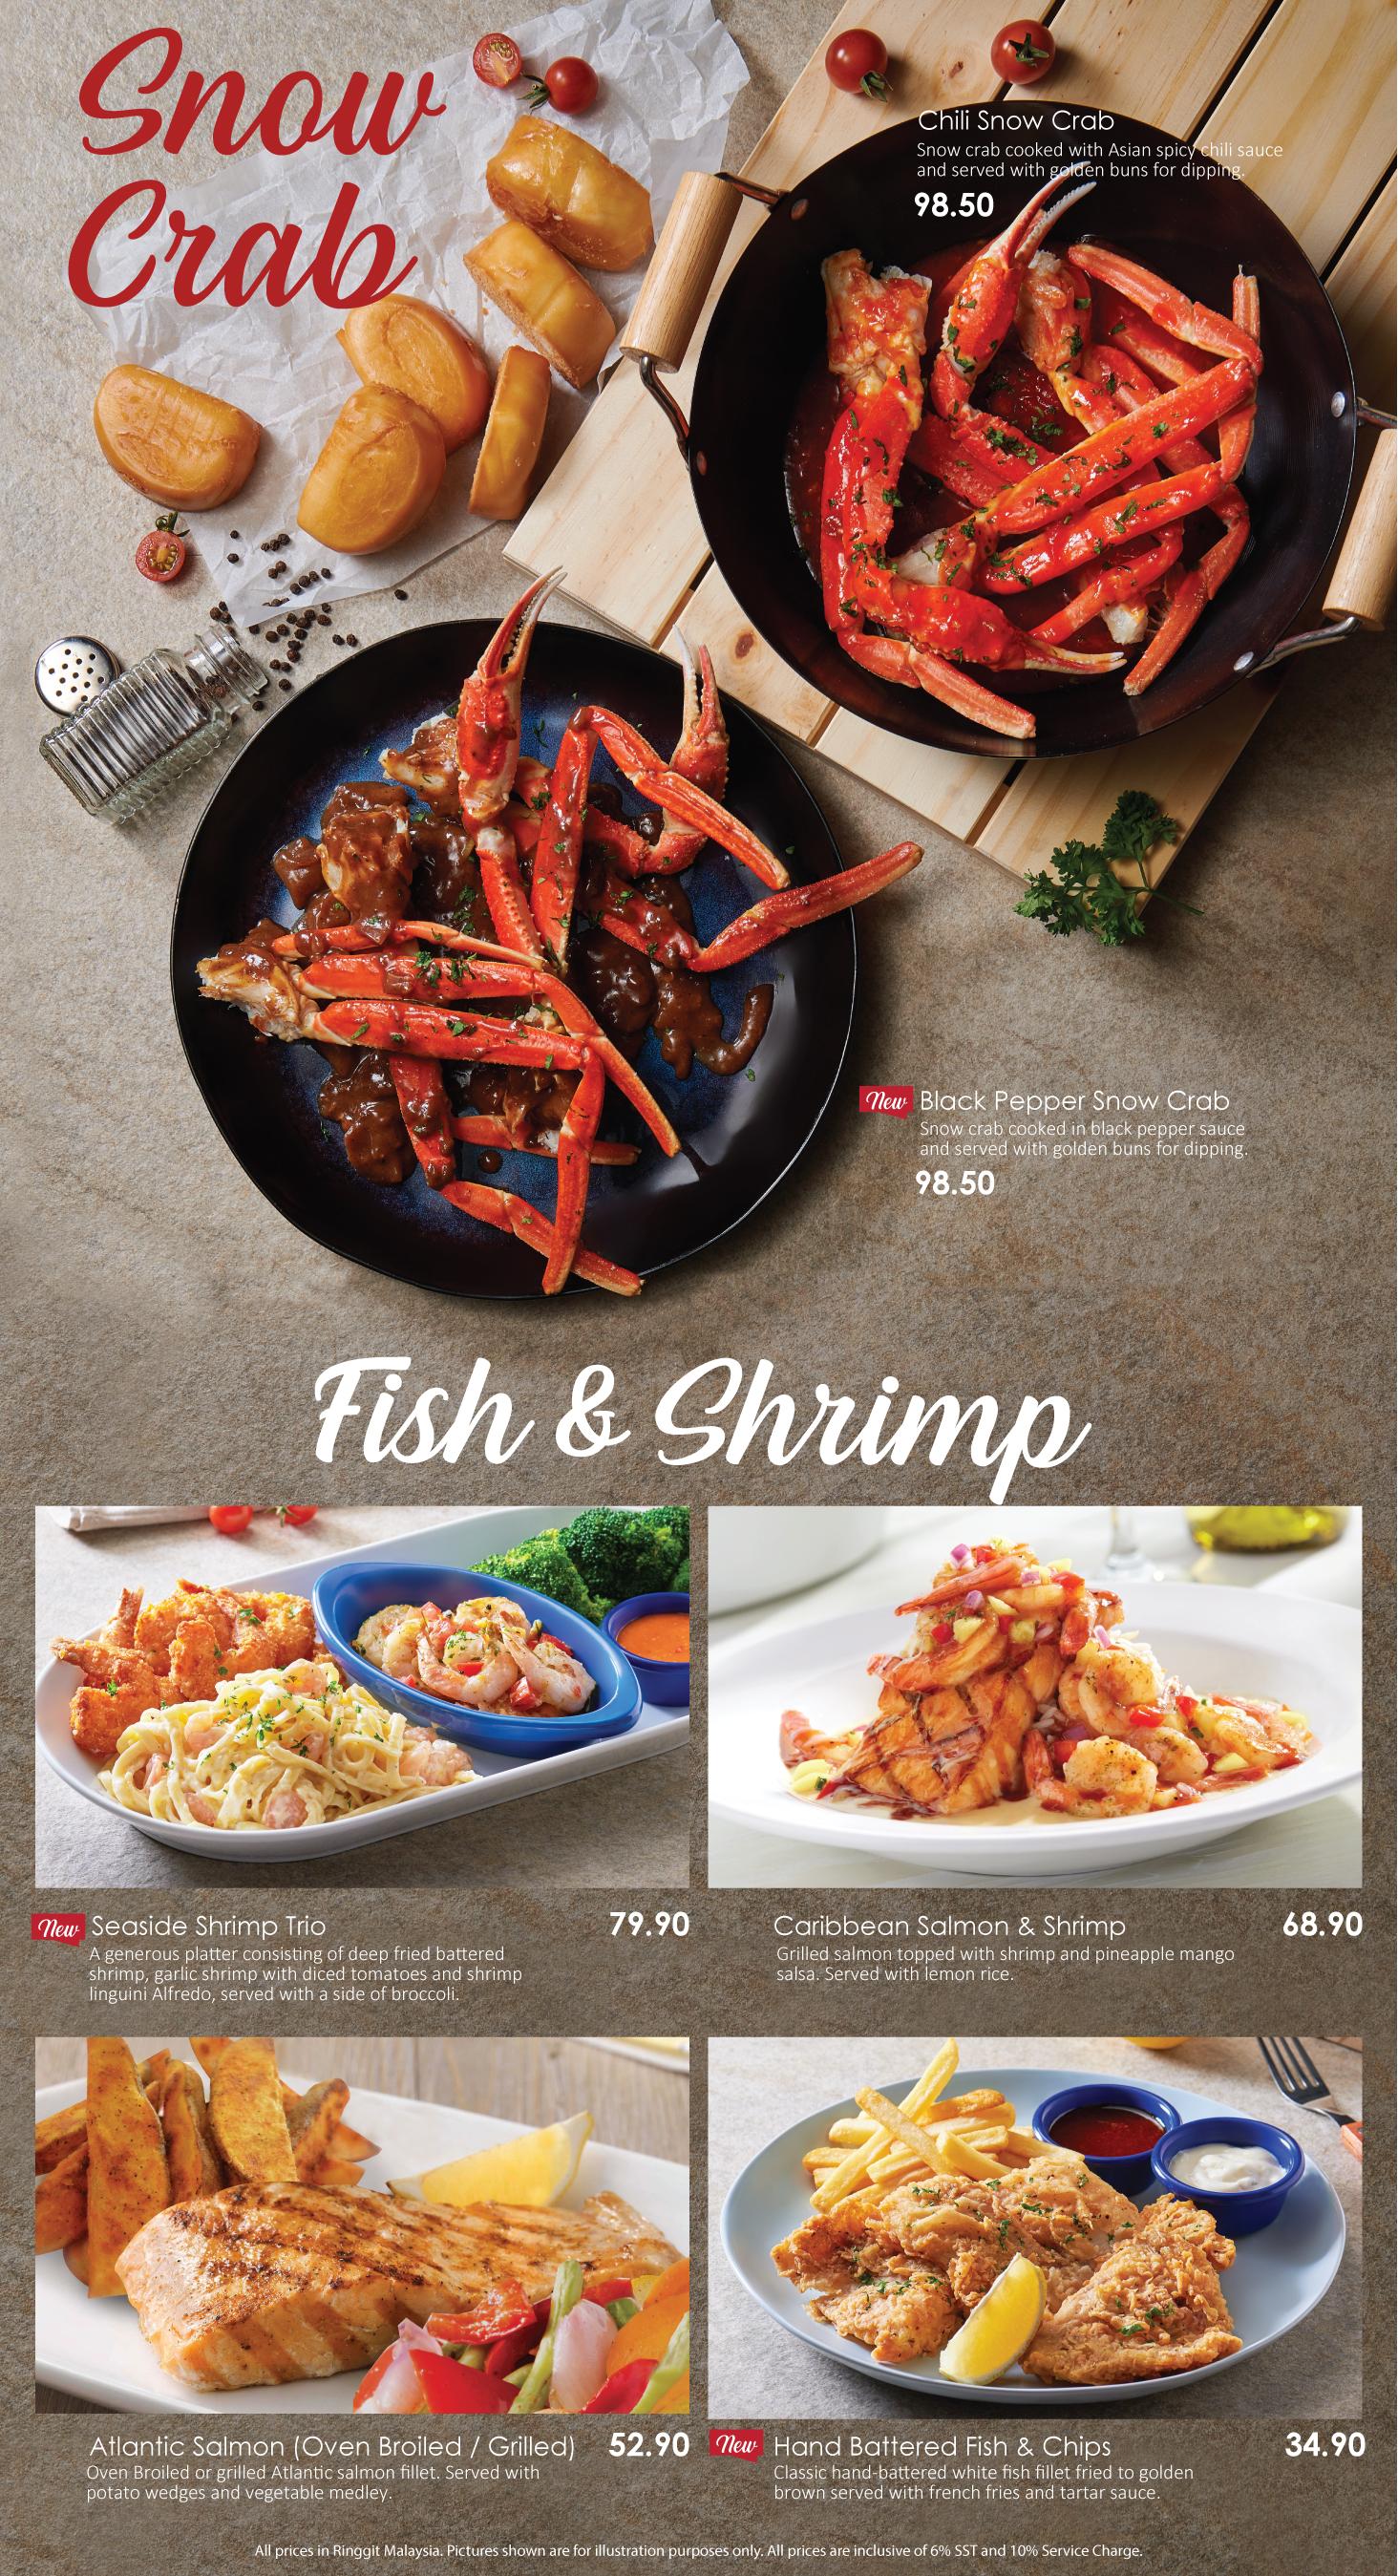 09-Crab-Fish-&-Shrimp.jpg